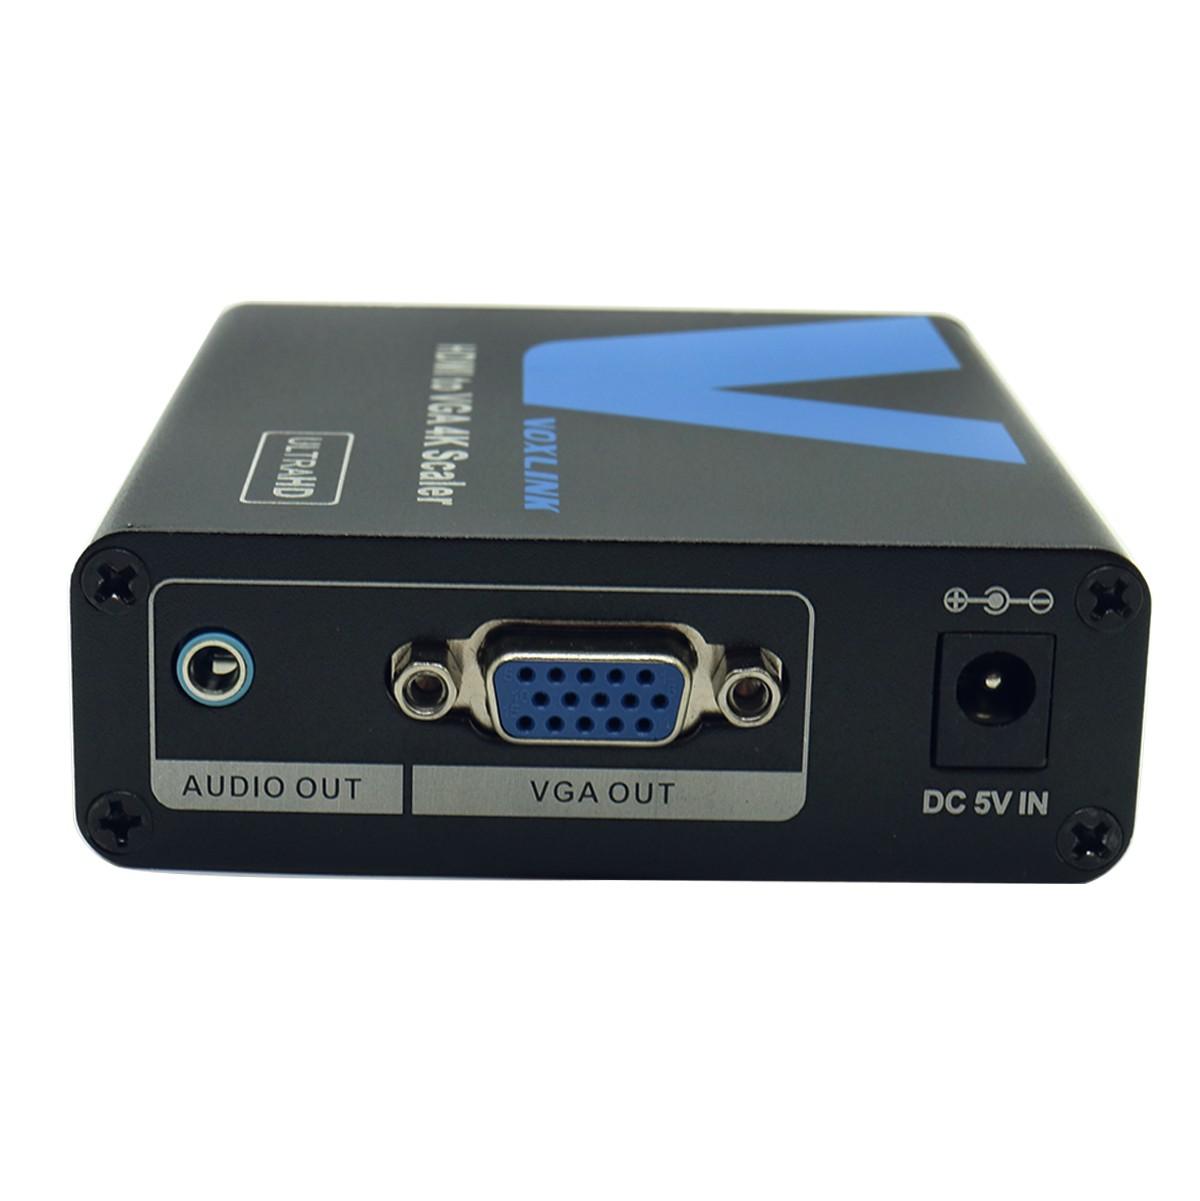 VOXLINK 4Kx2K HDMI to VGA Converter Box